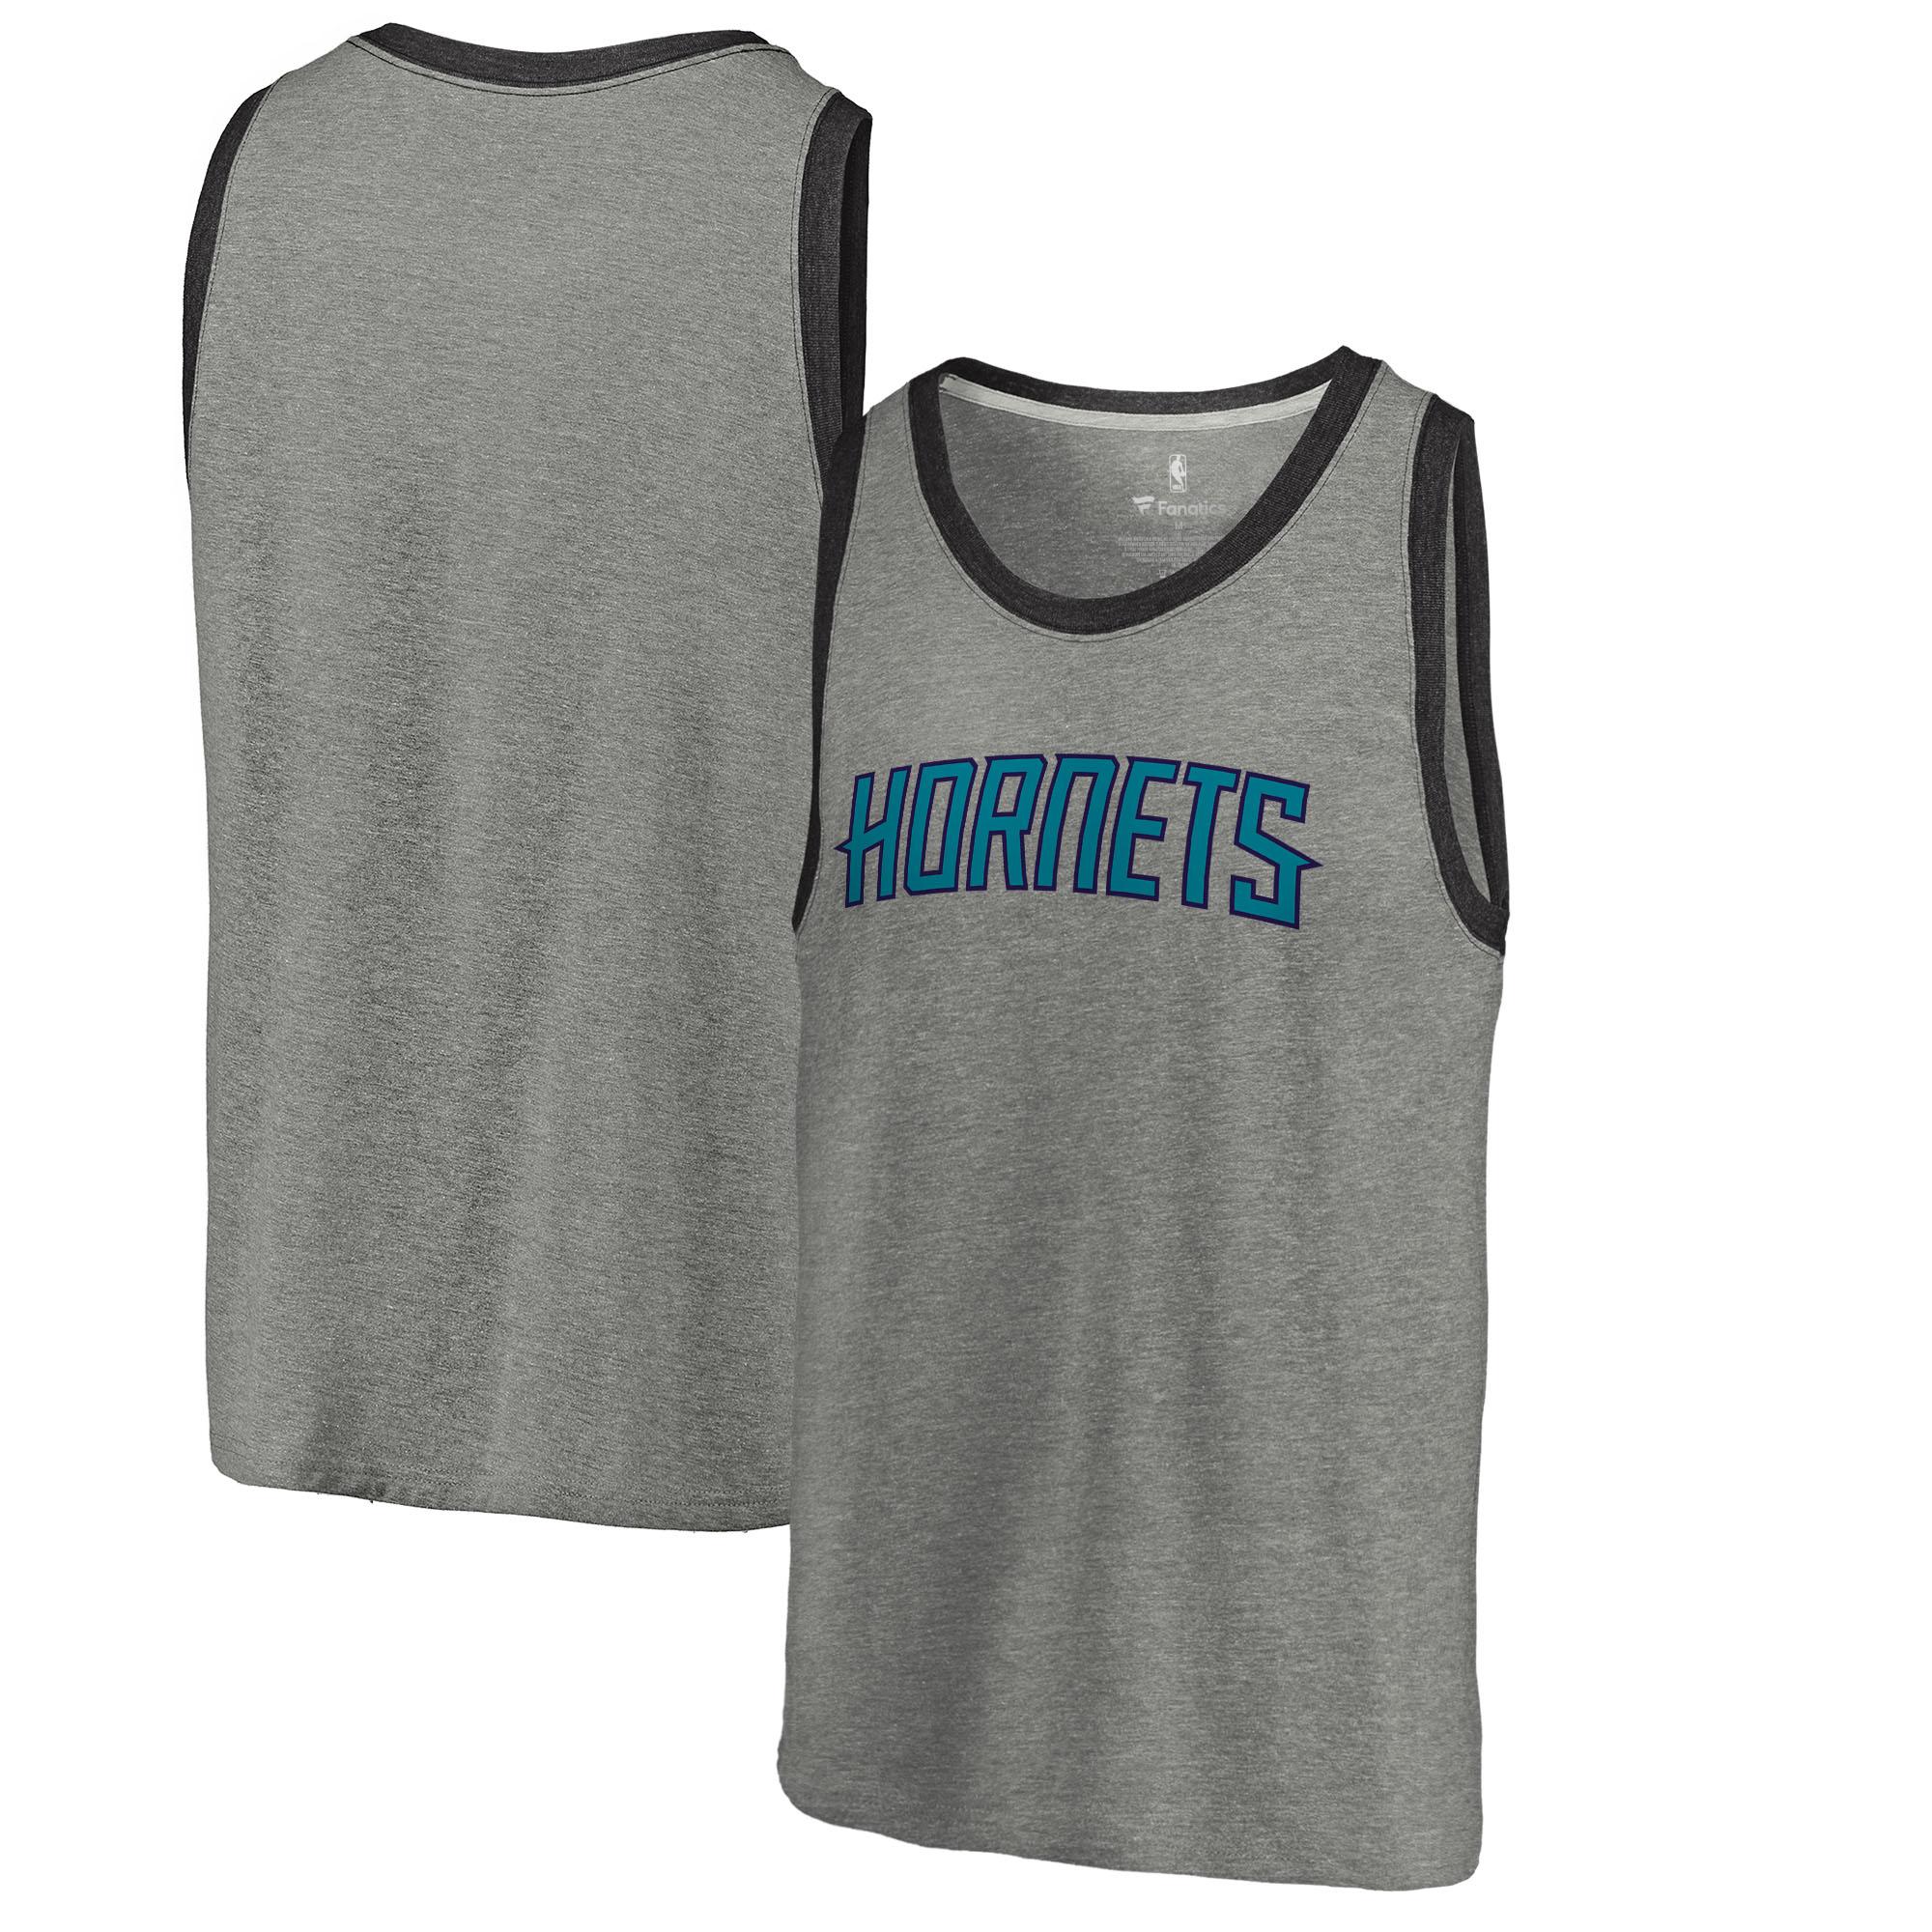 Charlotte Hornets Fanatics Branded Wordmark Tri-Blend Tank Top - Heathered Gray